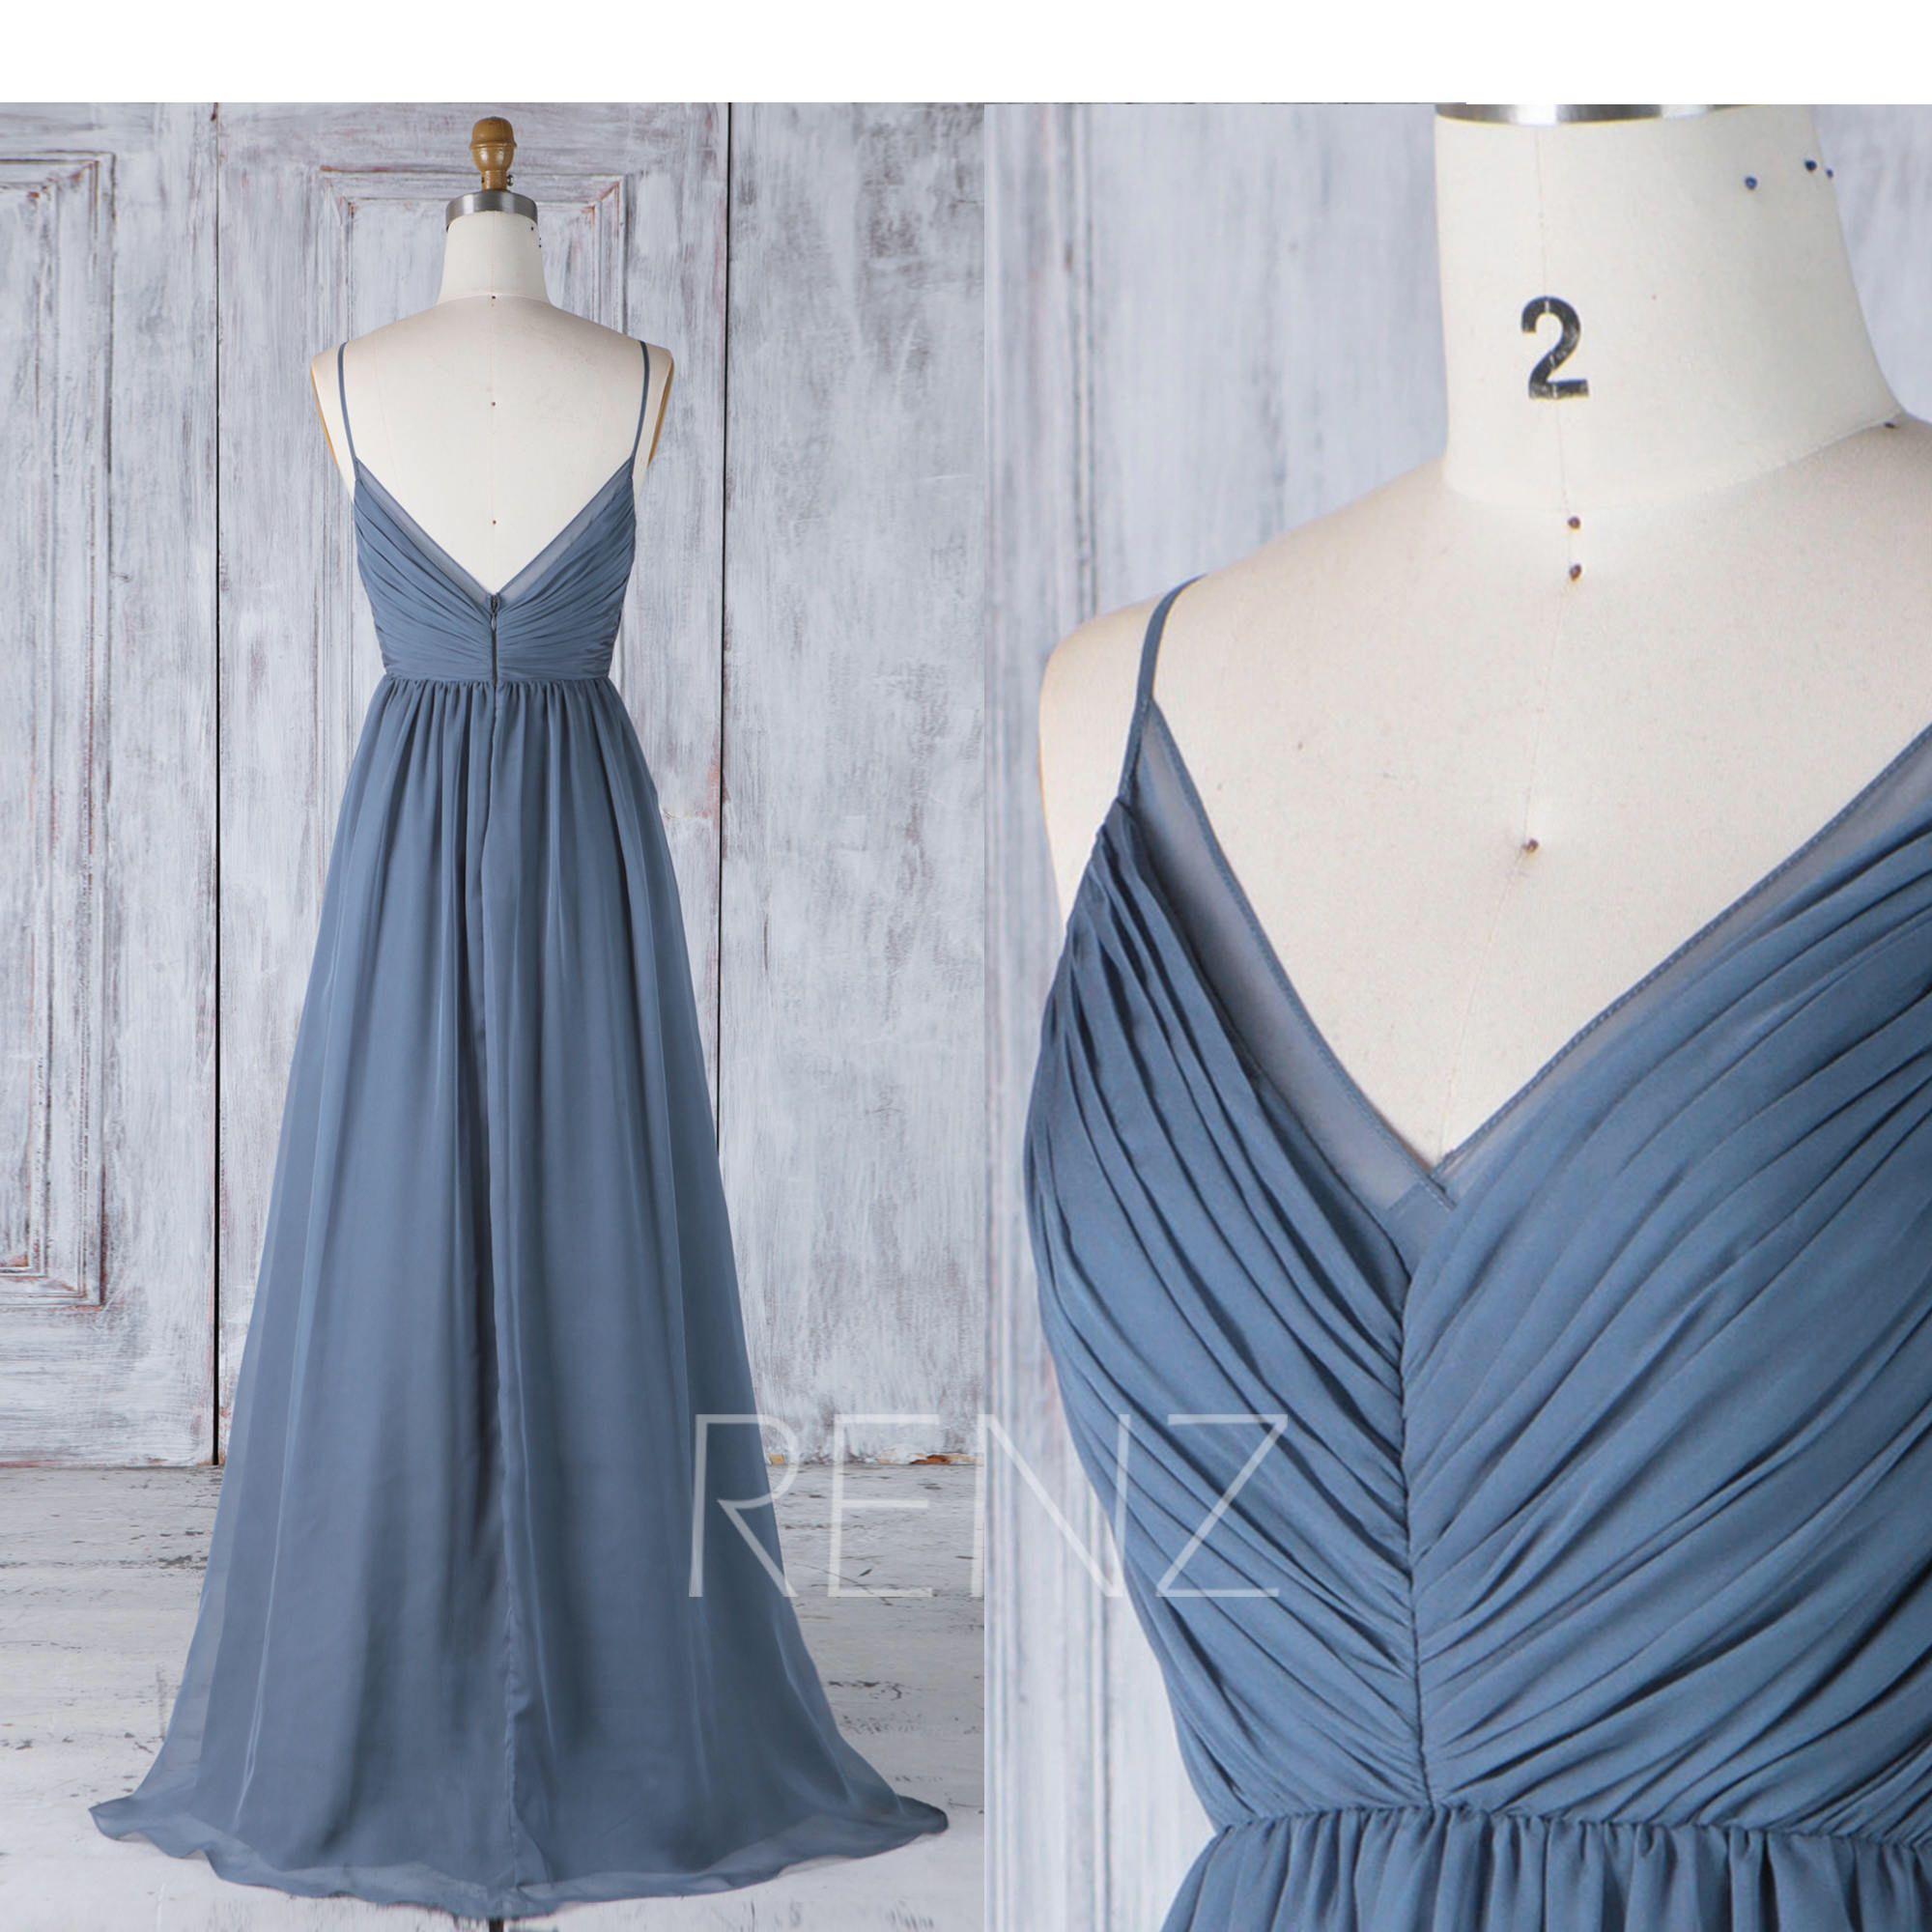 Long Bridesmaid Dress Dark Steel Blue Backless Simple Wedding Dress Chiffon Backless Prom Dress Long (H505A) #dolistsorbooks